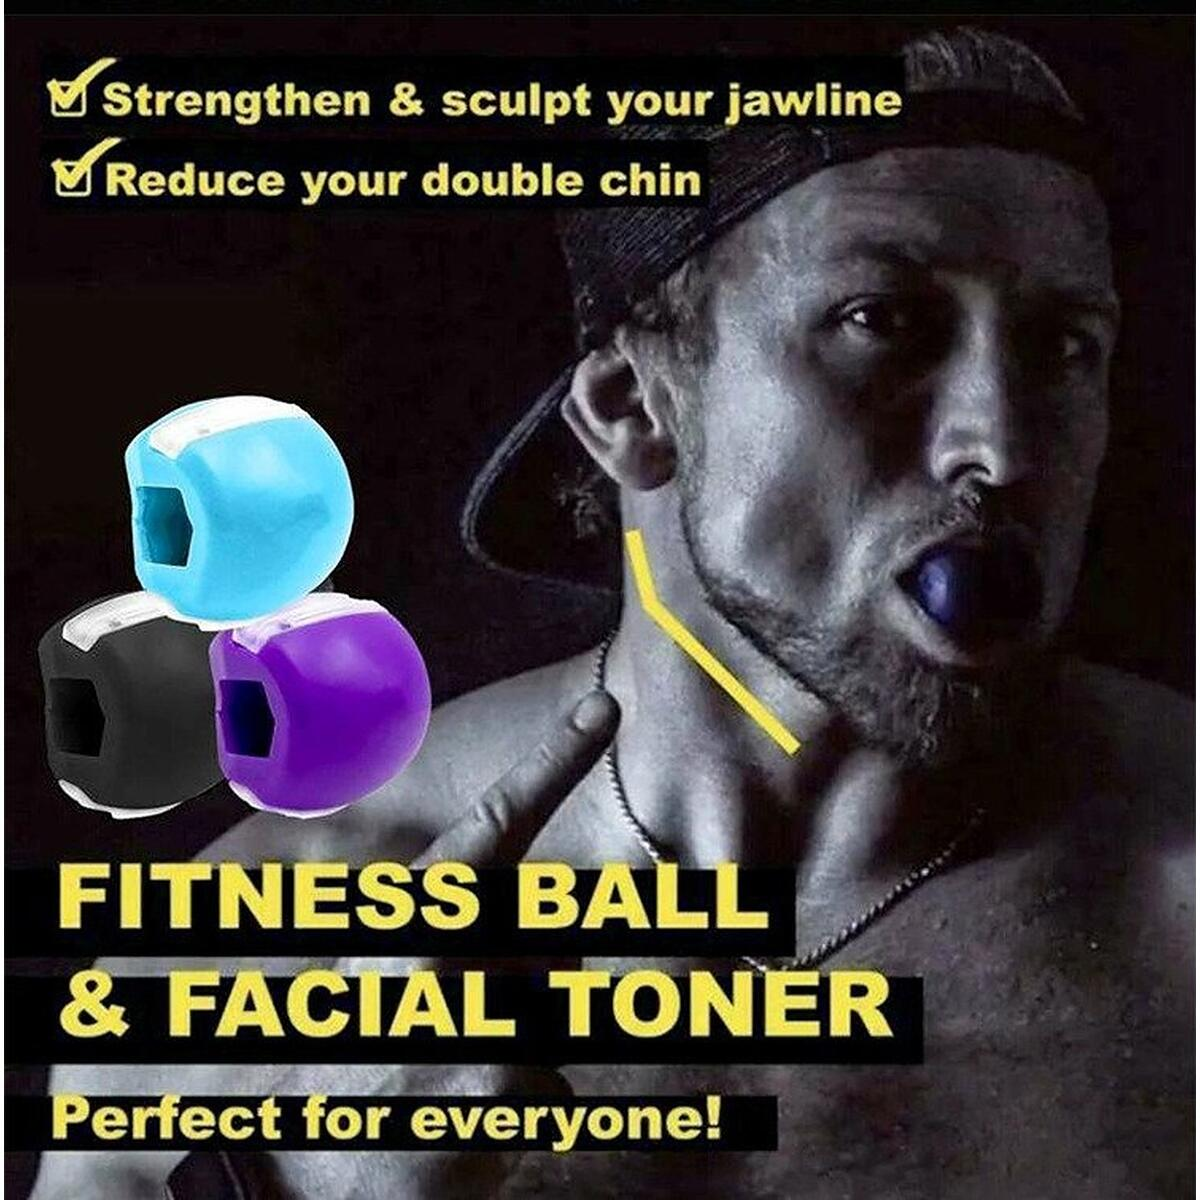 Jawzrsize Jaw Exerciser, Chisell Jawline, Jaw Exercise, Jaw Strengthener, Jawzrsize Jaw Exerciser And Neck Toning, Face Excersize Tool, Jaw Excersizer